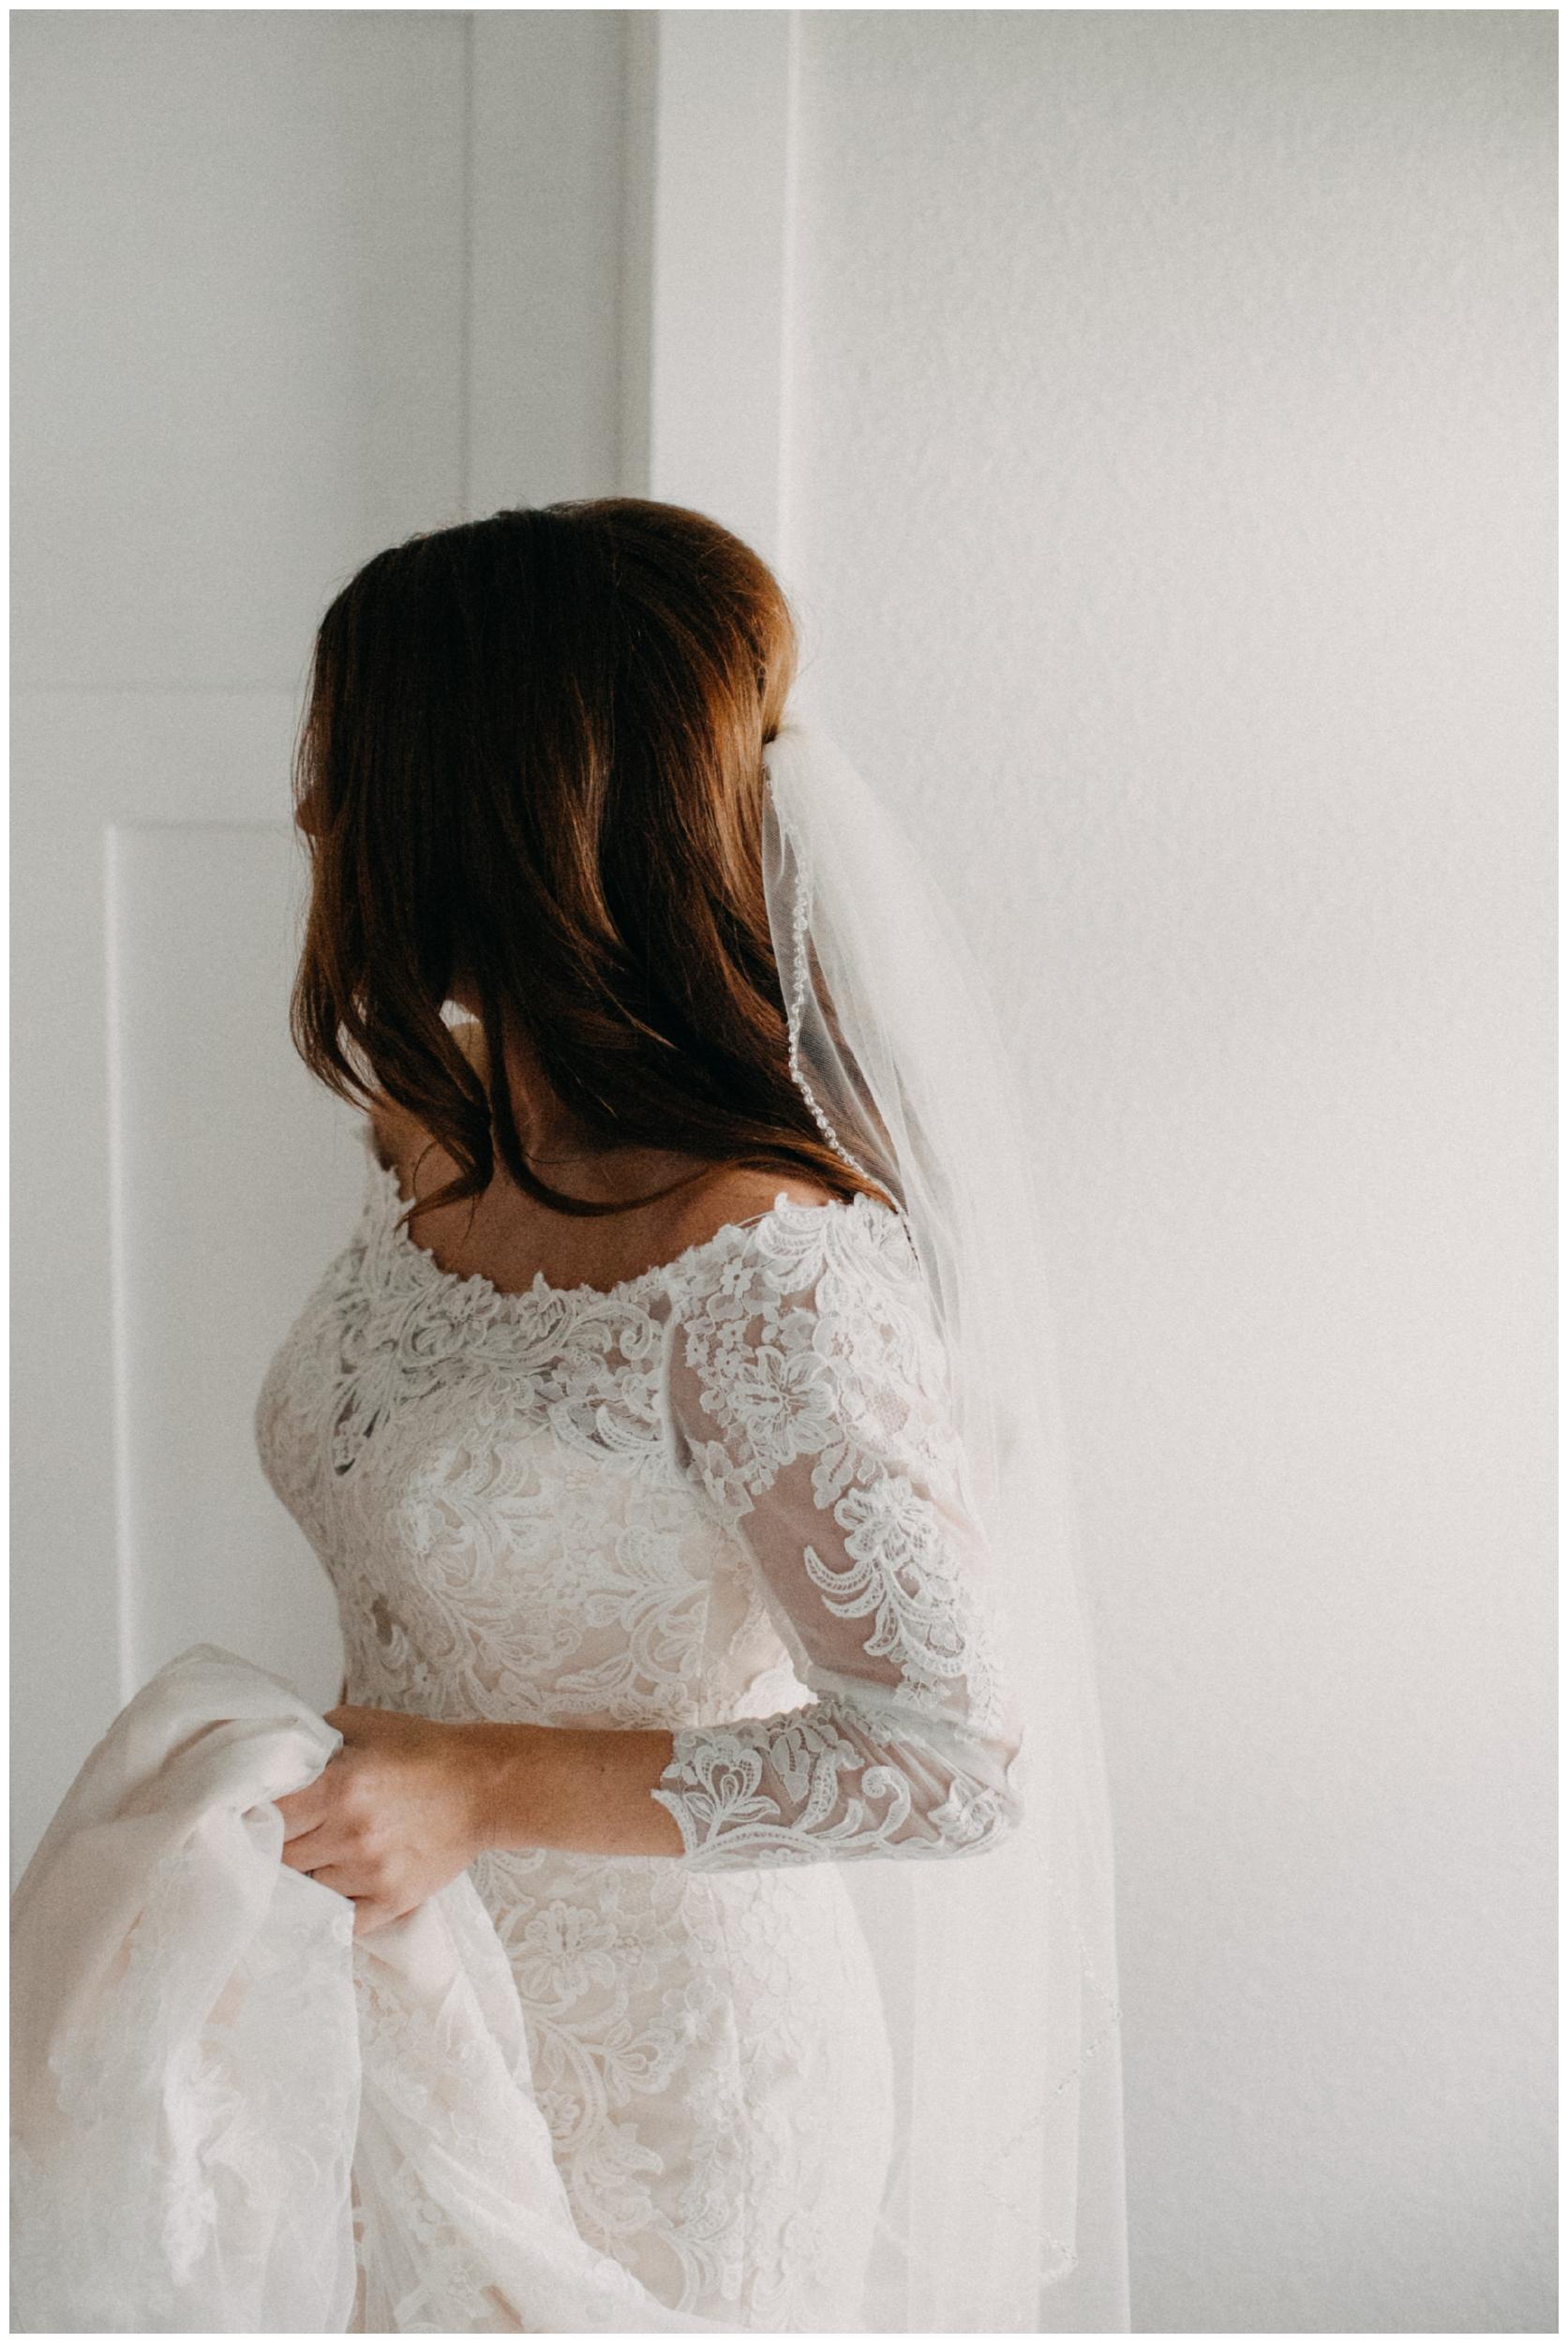 Modern and minimalistic bridal portrait at the Quarterdeck resort on Gull Lake